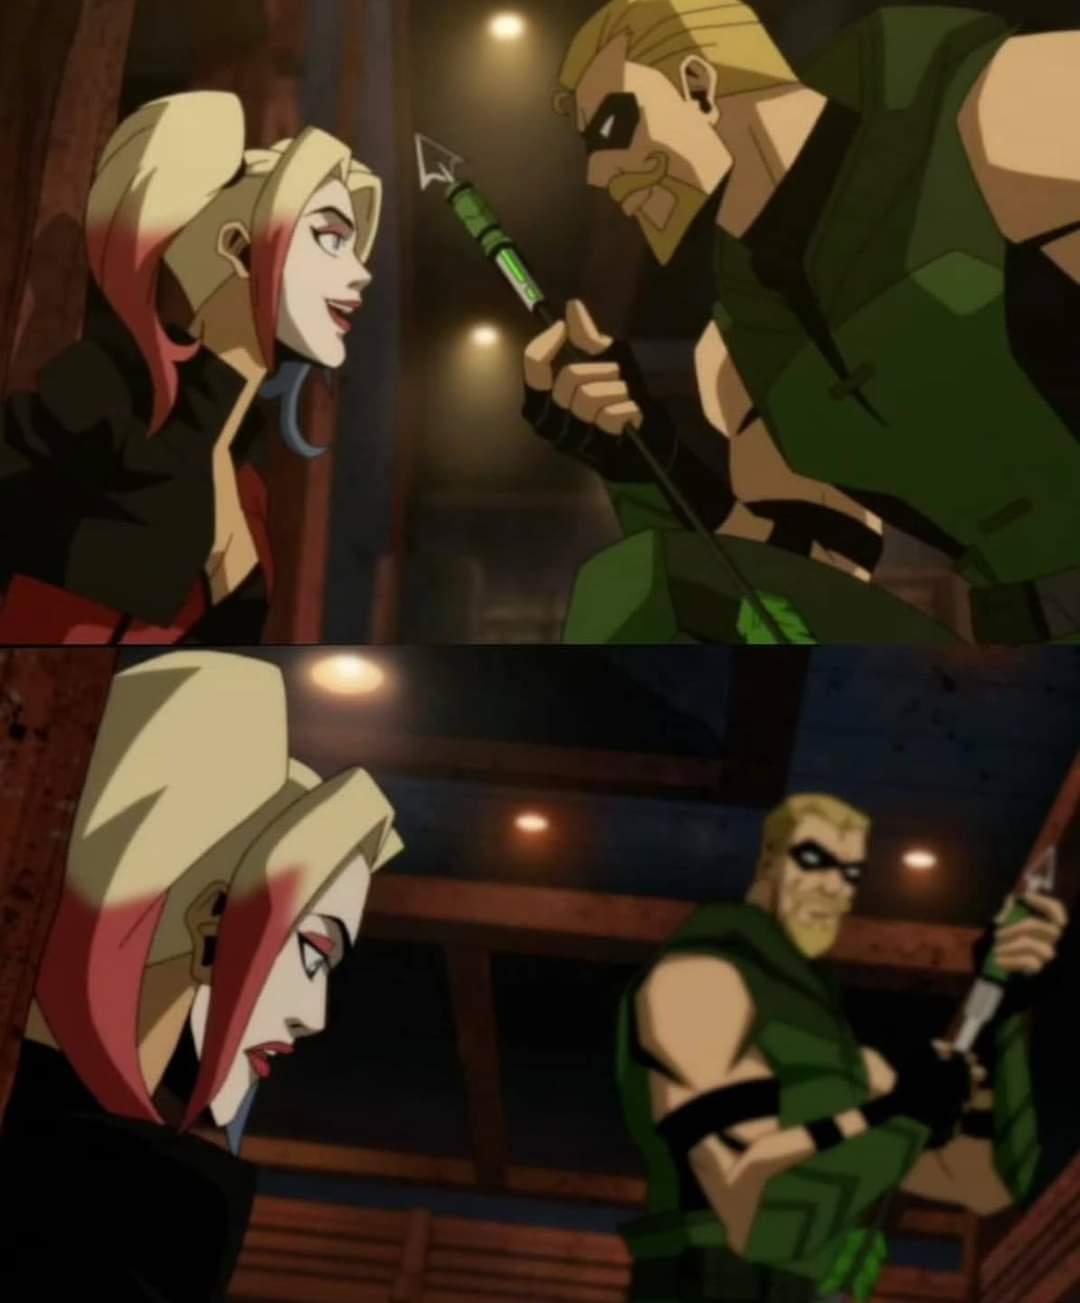 Injustice pelicula animada harley quinn green arrow